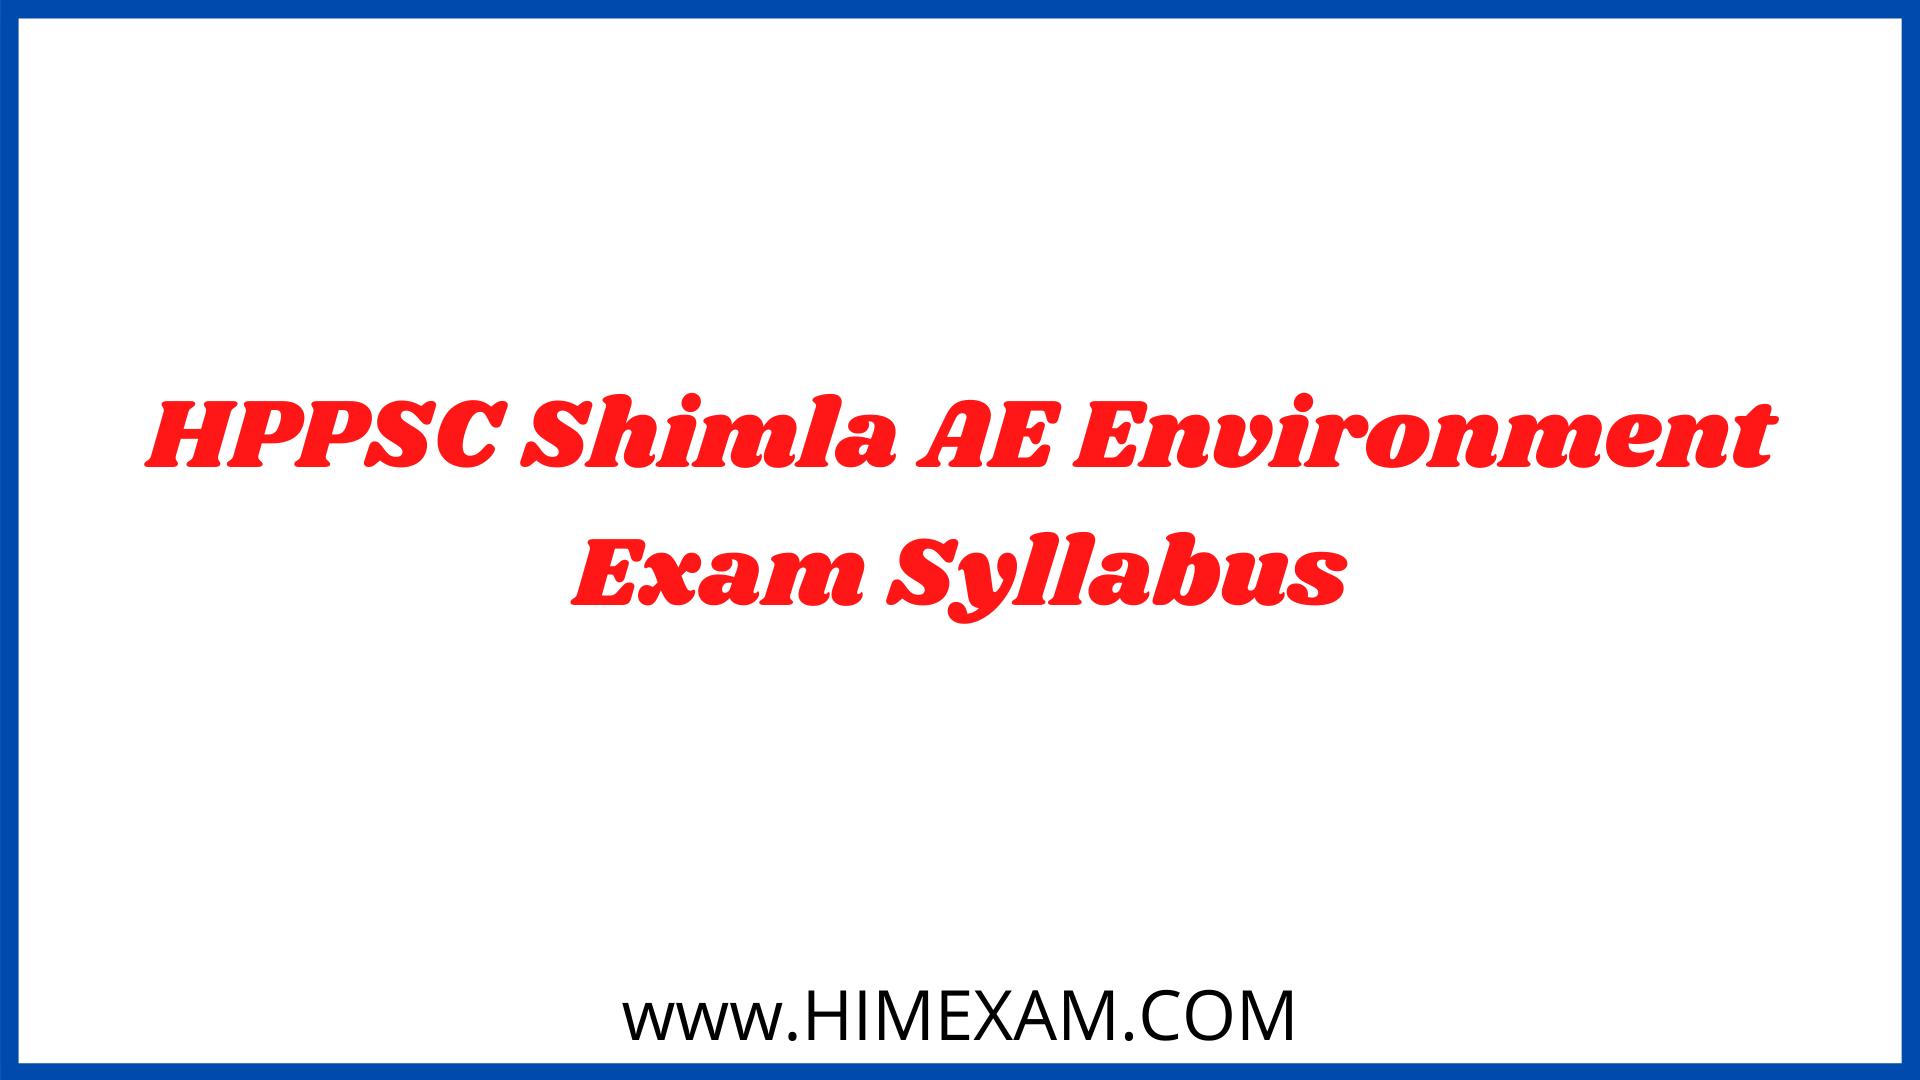 HPPSC Shimla AE Environment Exam Syllabus